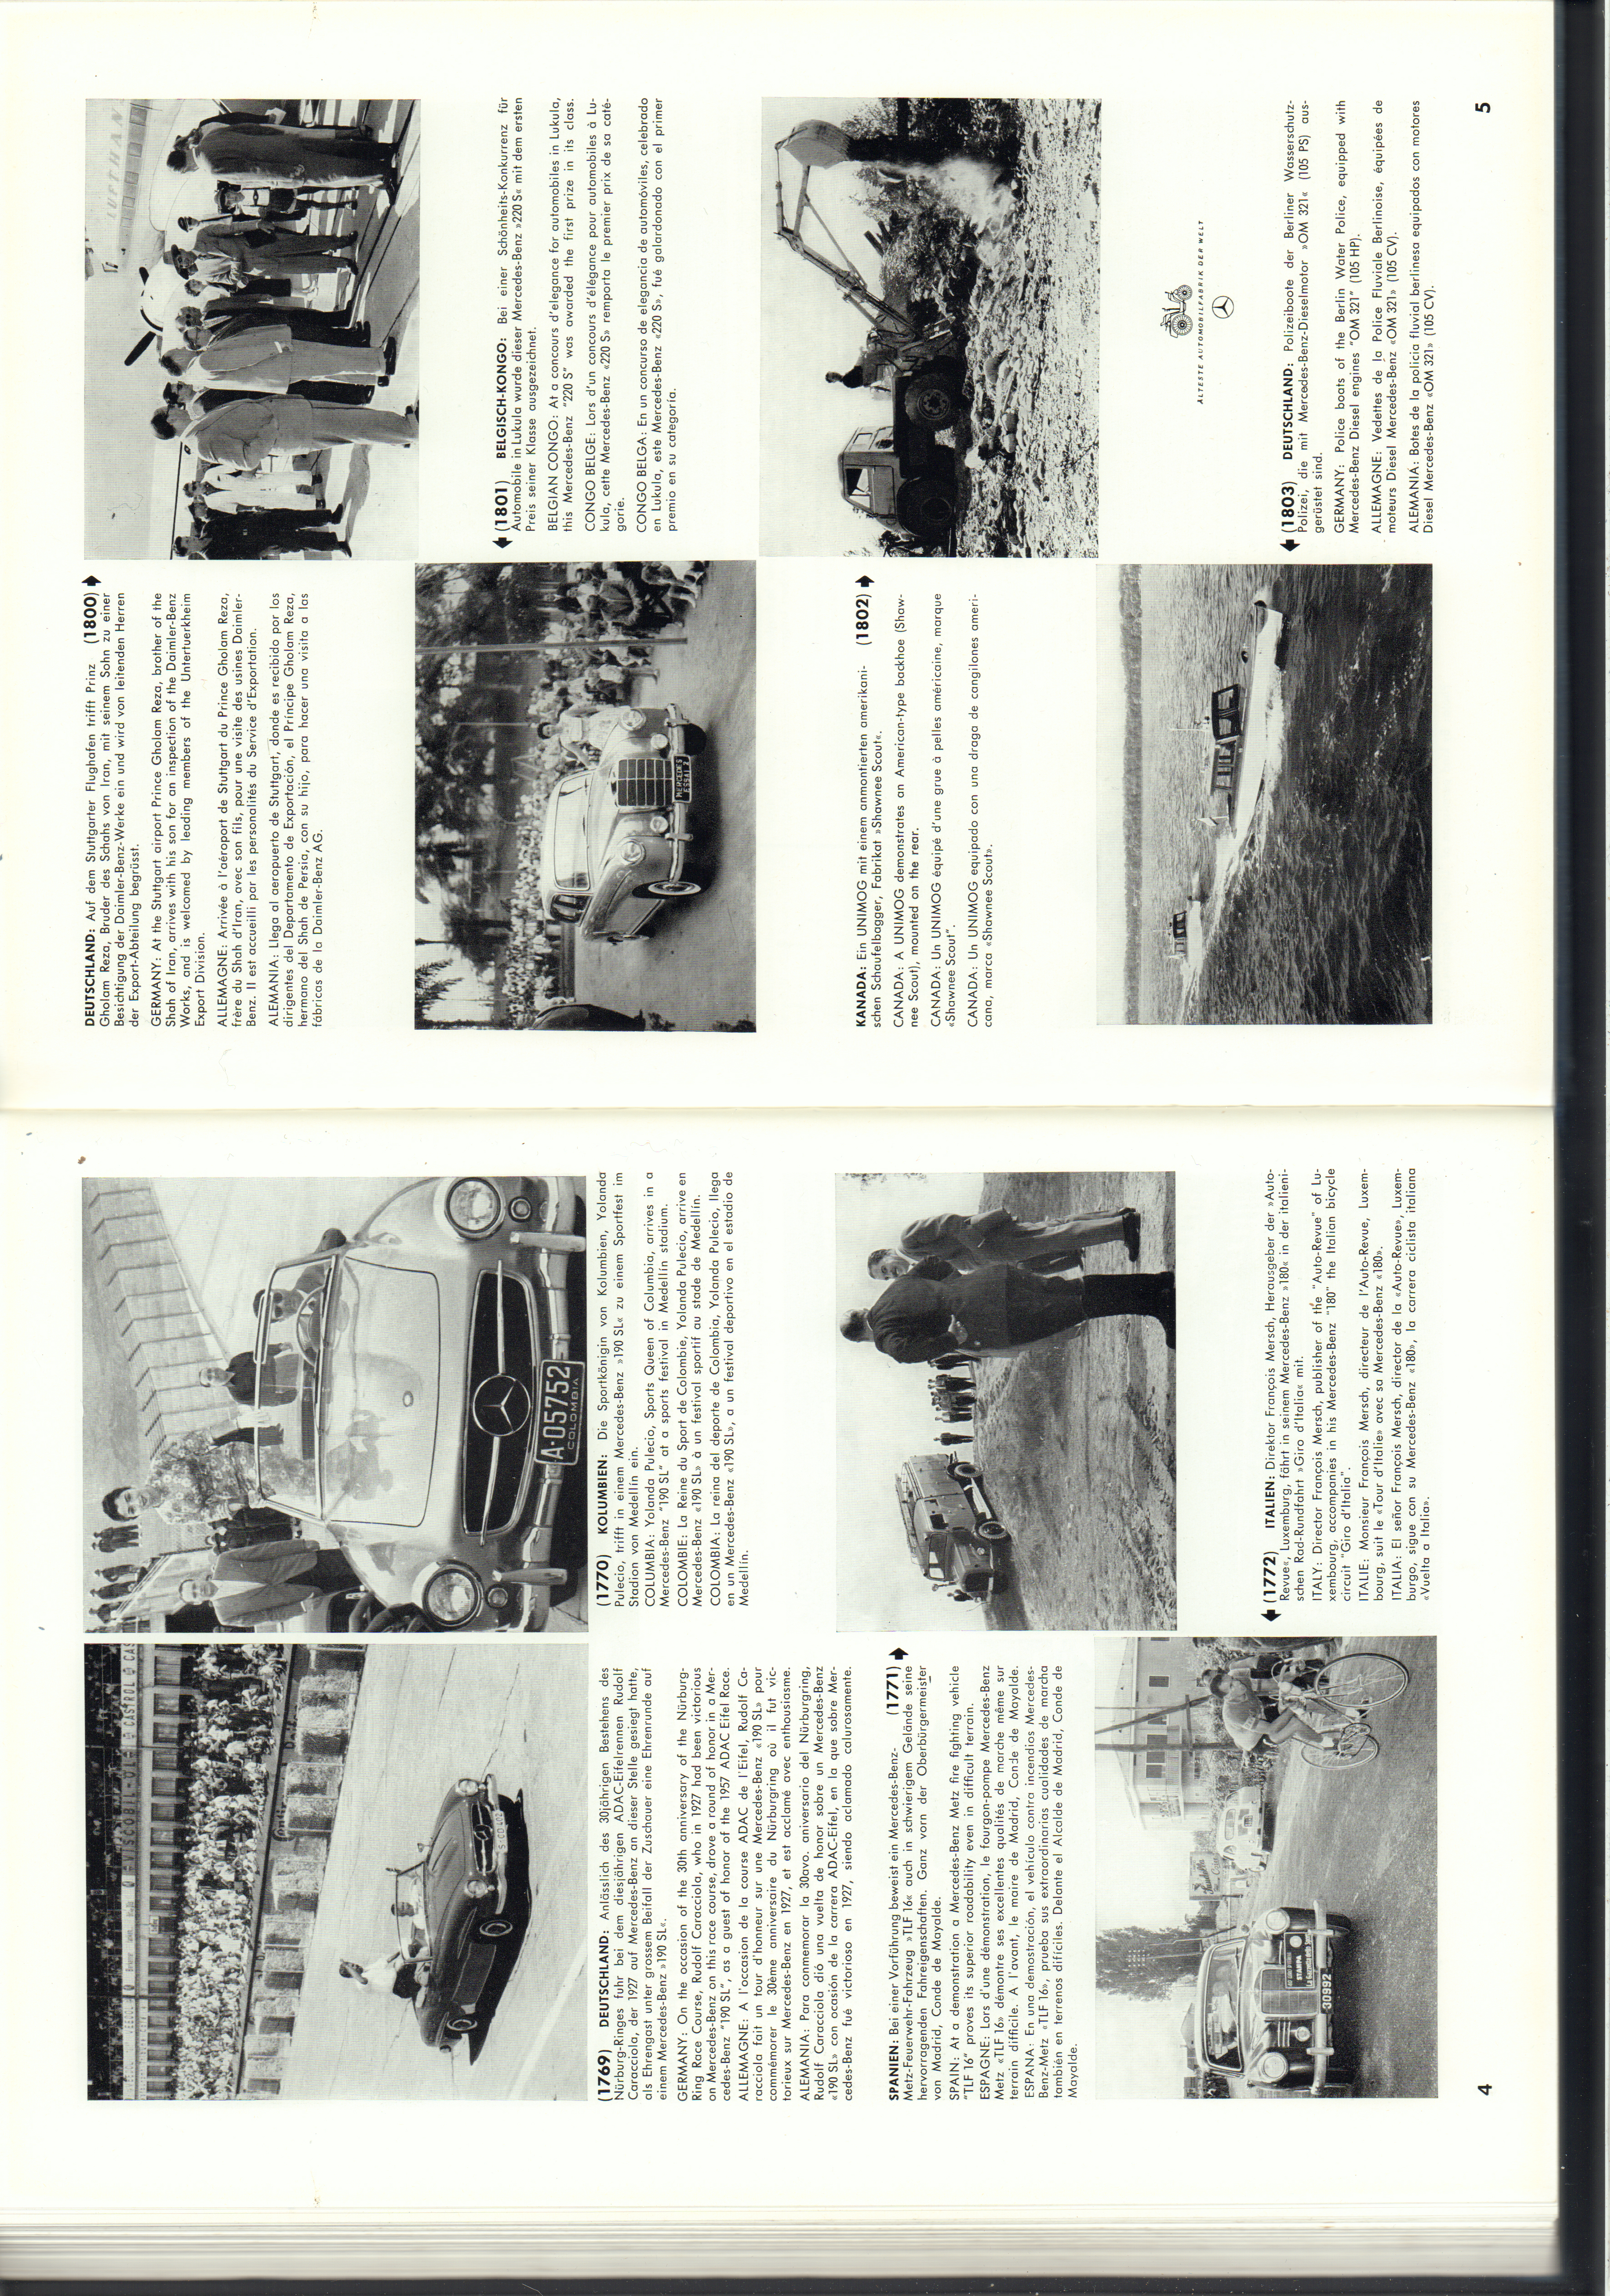 (REVISTA): Periódico In aller welt n.º 14 - Mercedes-Benz no mundo - 1957 - multilingue 003